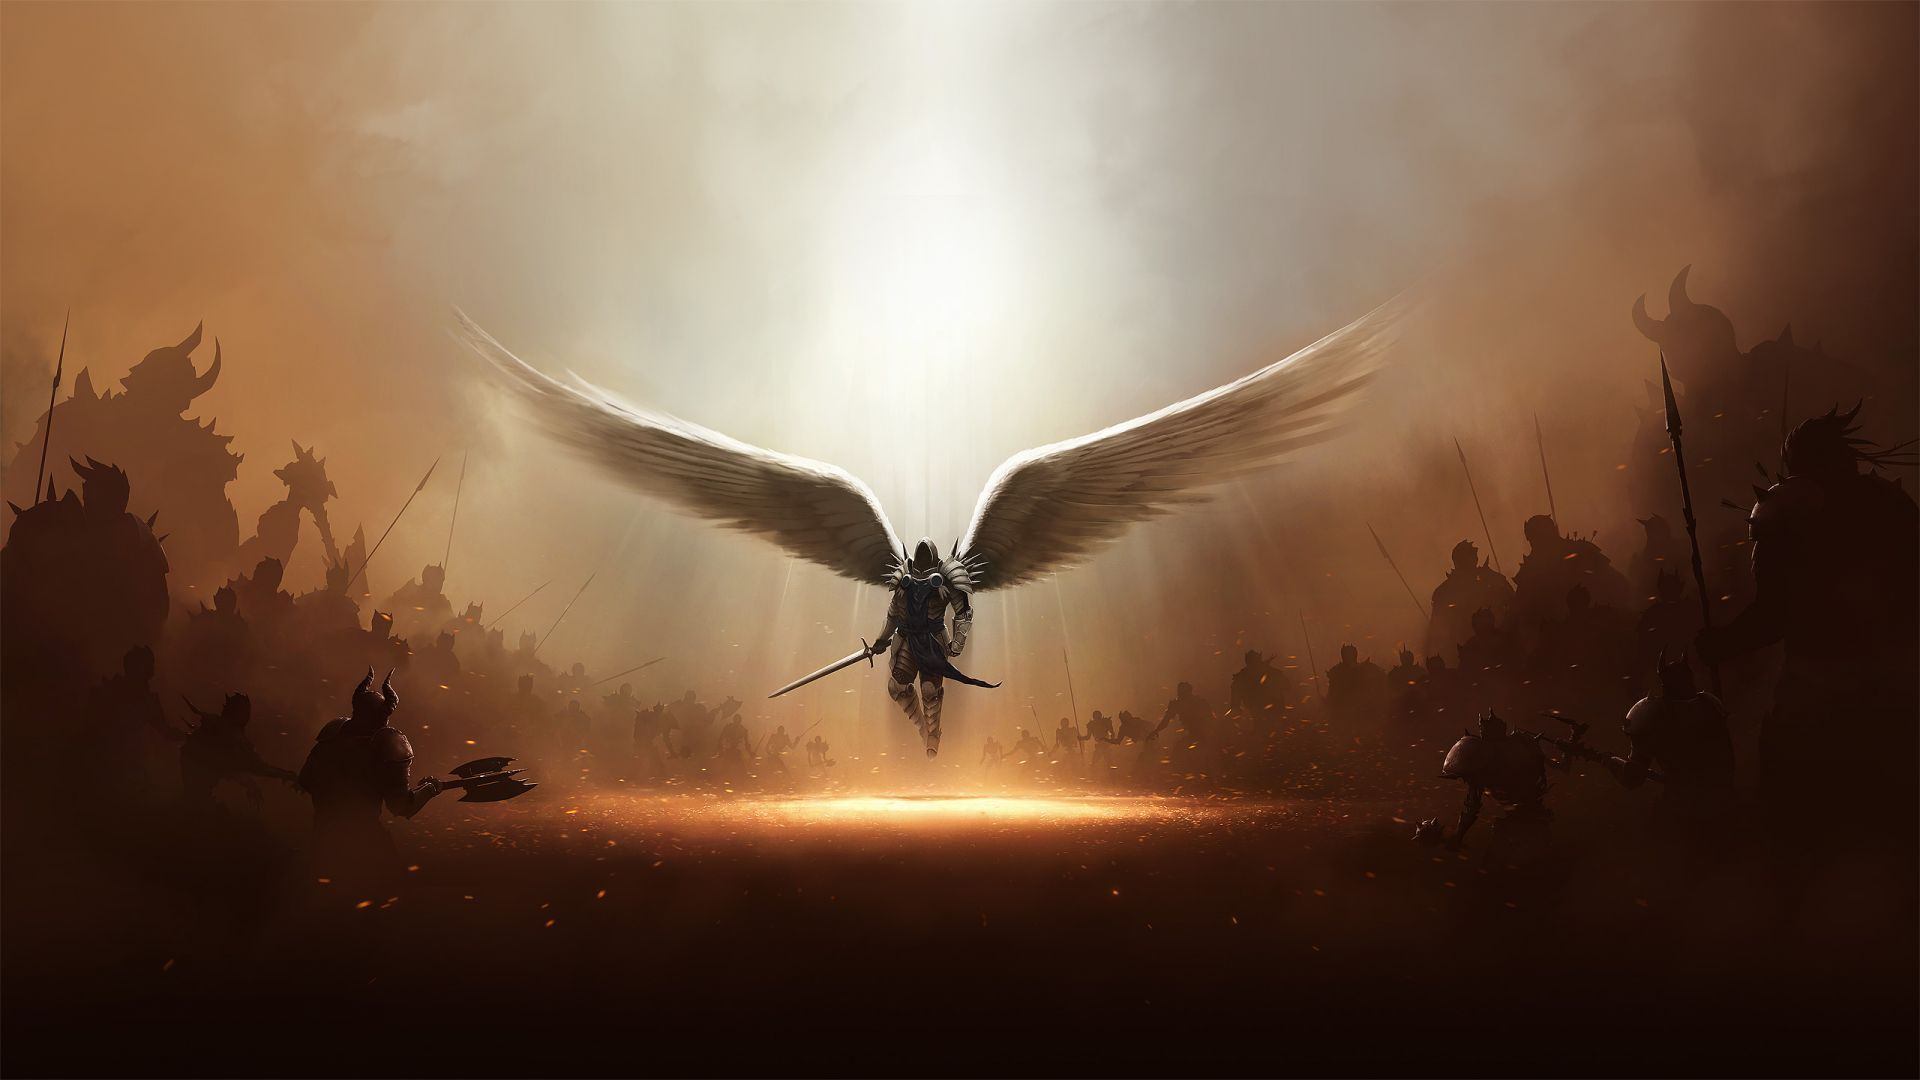 Angel Wallpaper 24 Jpg 1920 1080 Angel Wallpaper Archangels Angel Warrior